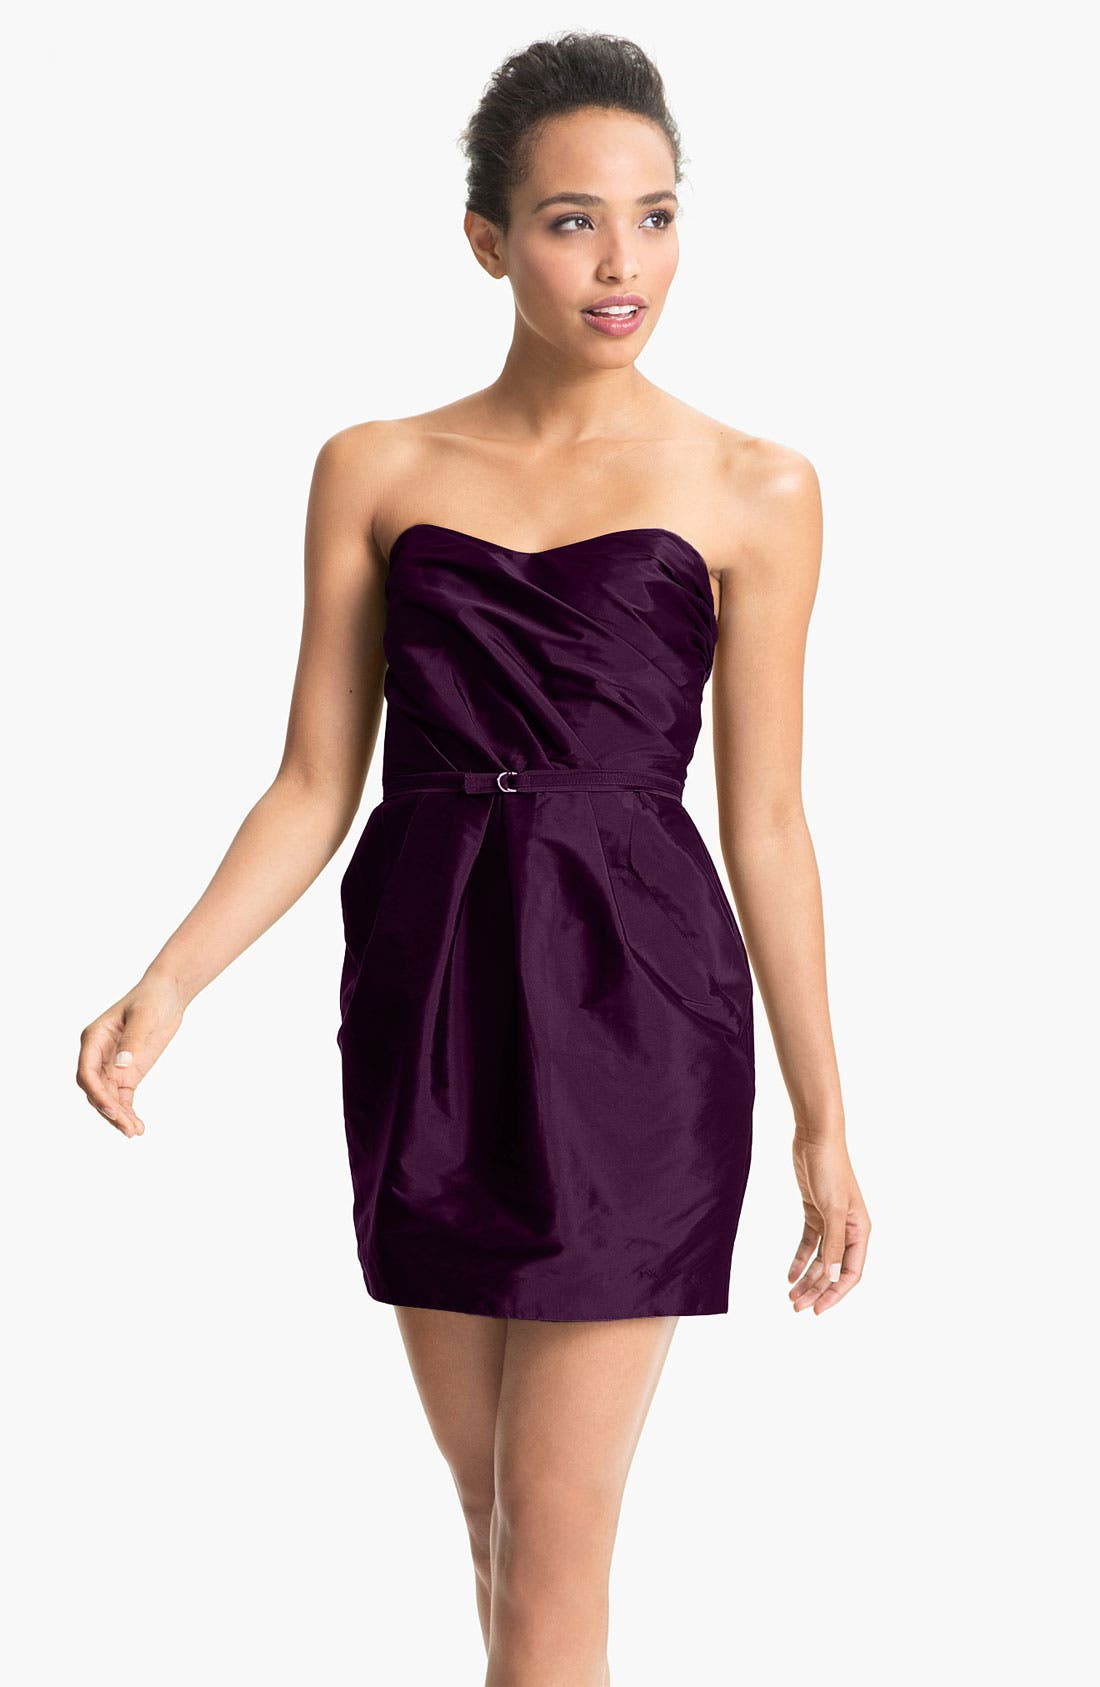 Alternate Image 1 Selected - Alexia Admor Strapless Taffeta Tulip Dress